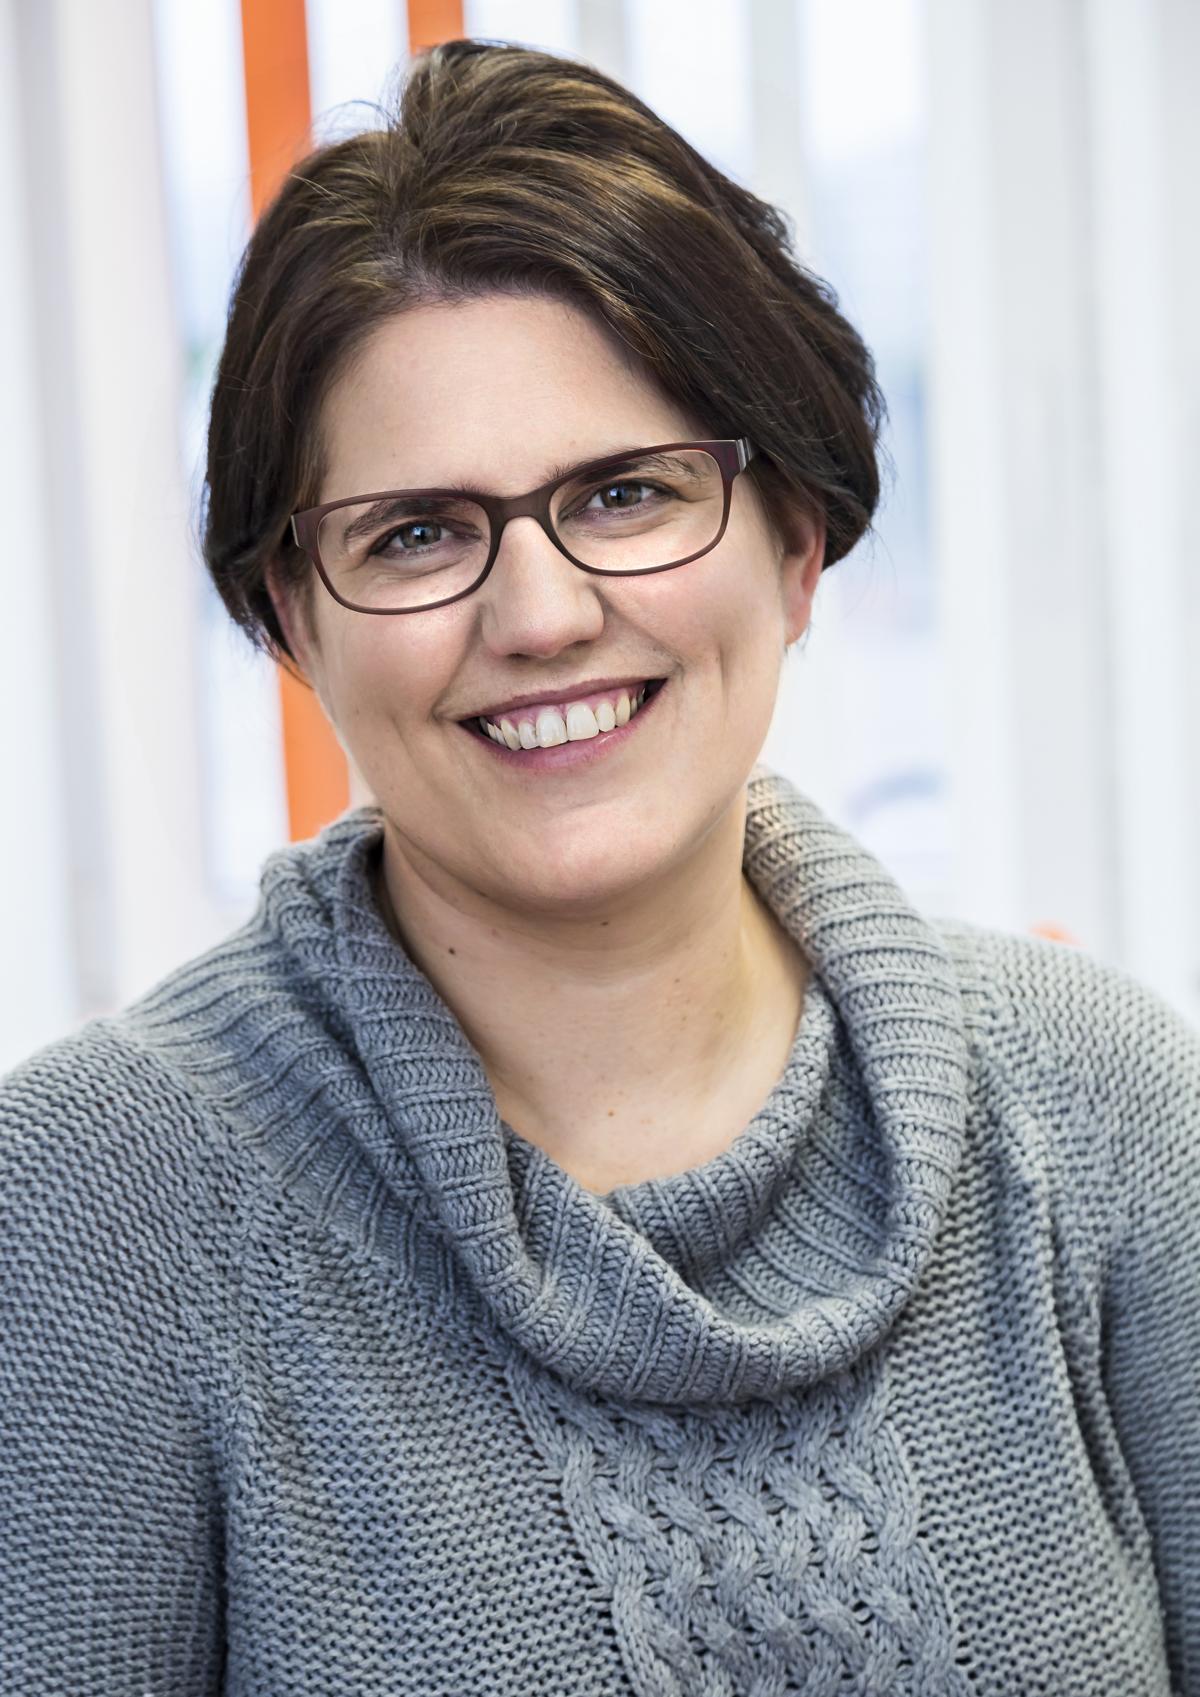 Nicole Rokahr